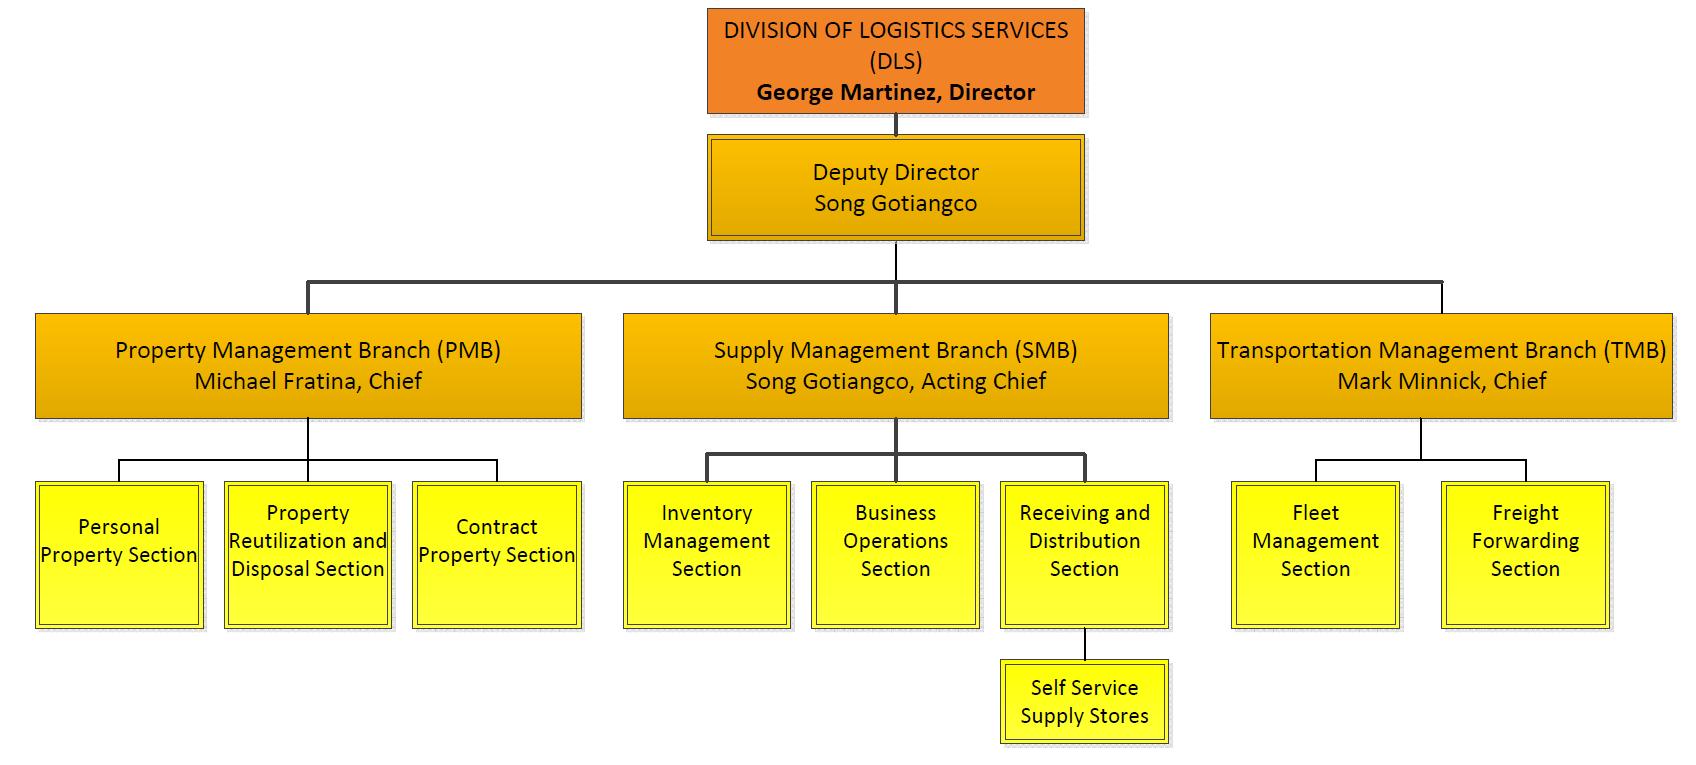 DLS Organization Structure | Office of Logistics & Acquisition ...